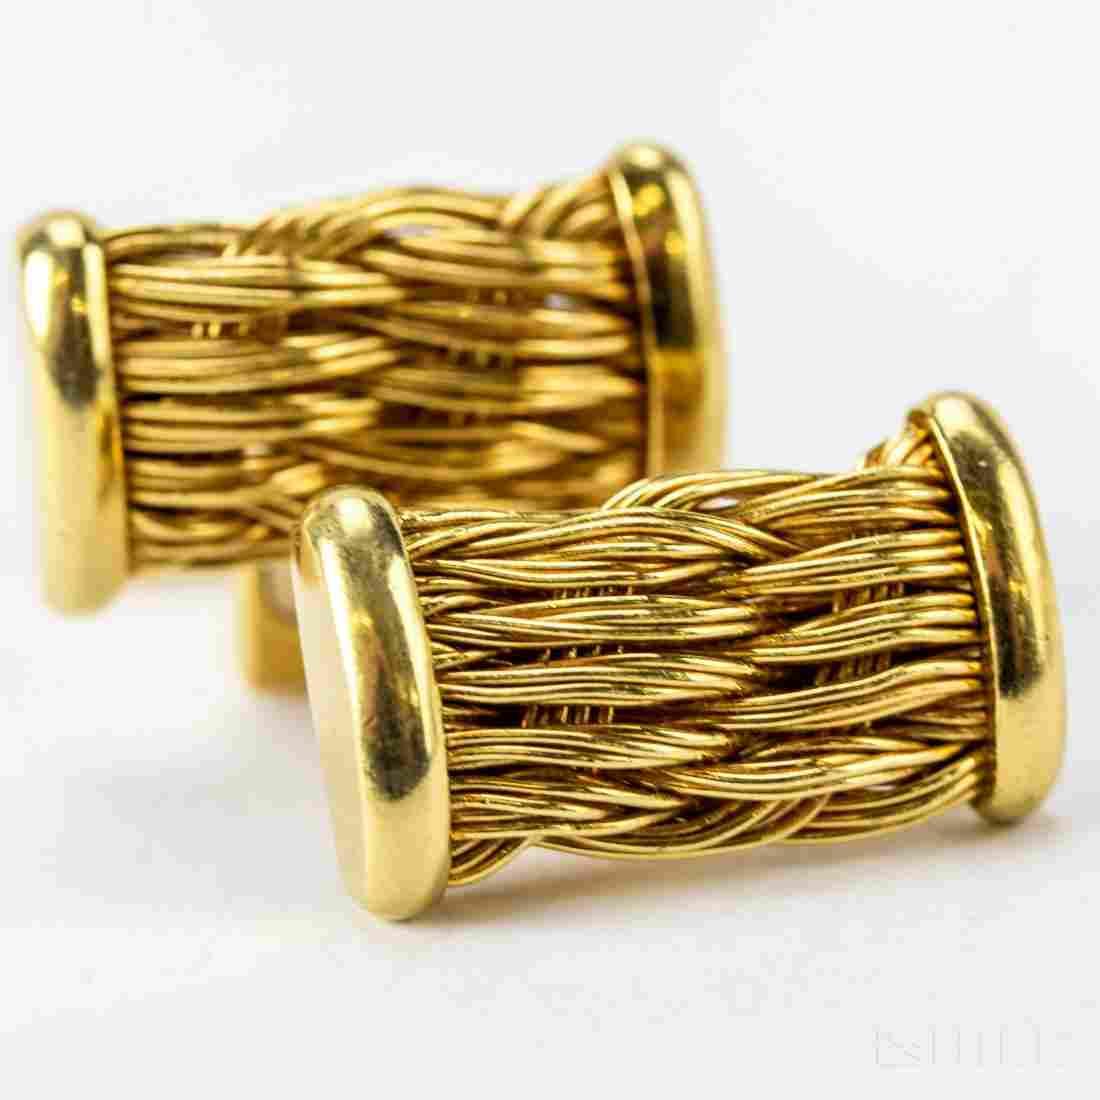 Men's Signed Henry Dunay 18k Gold Cufflinks VTG